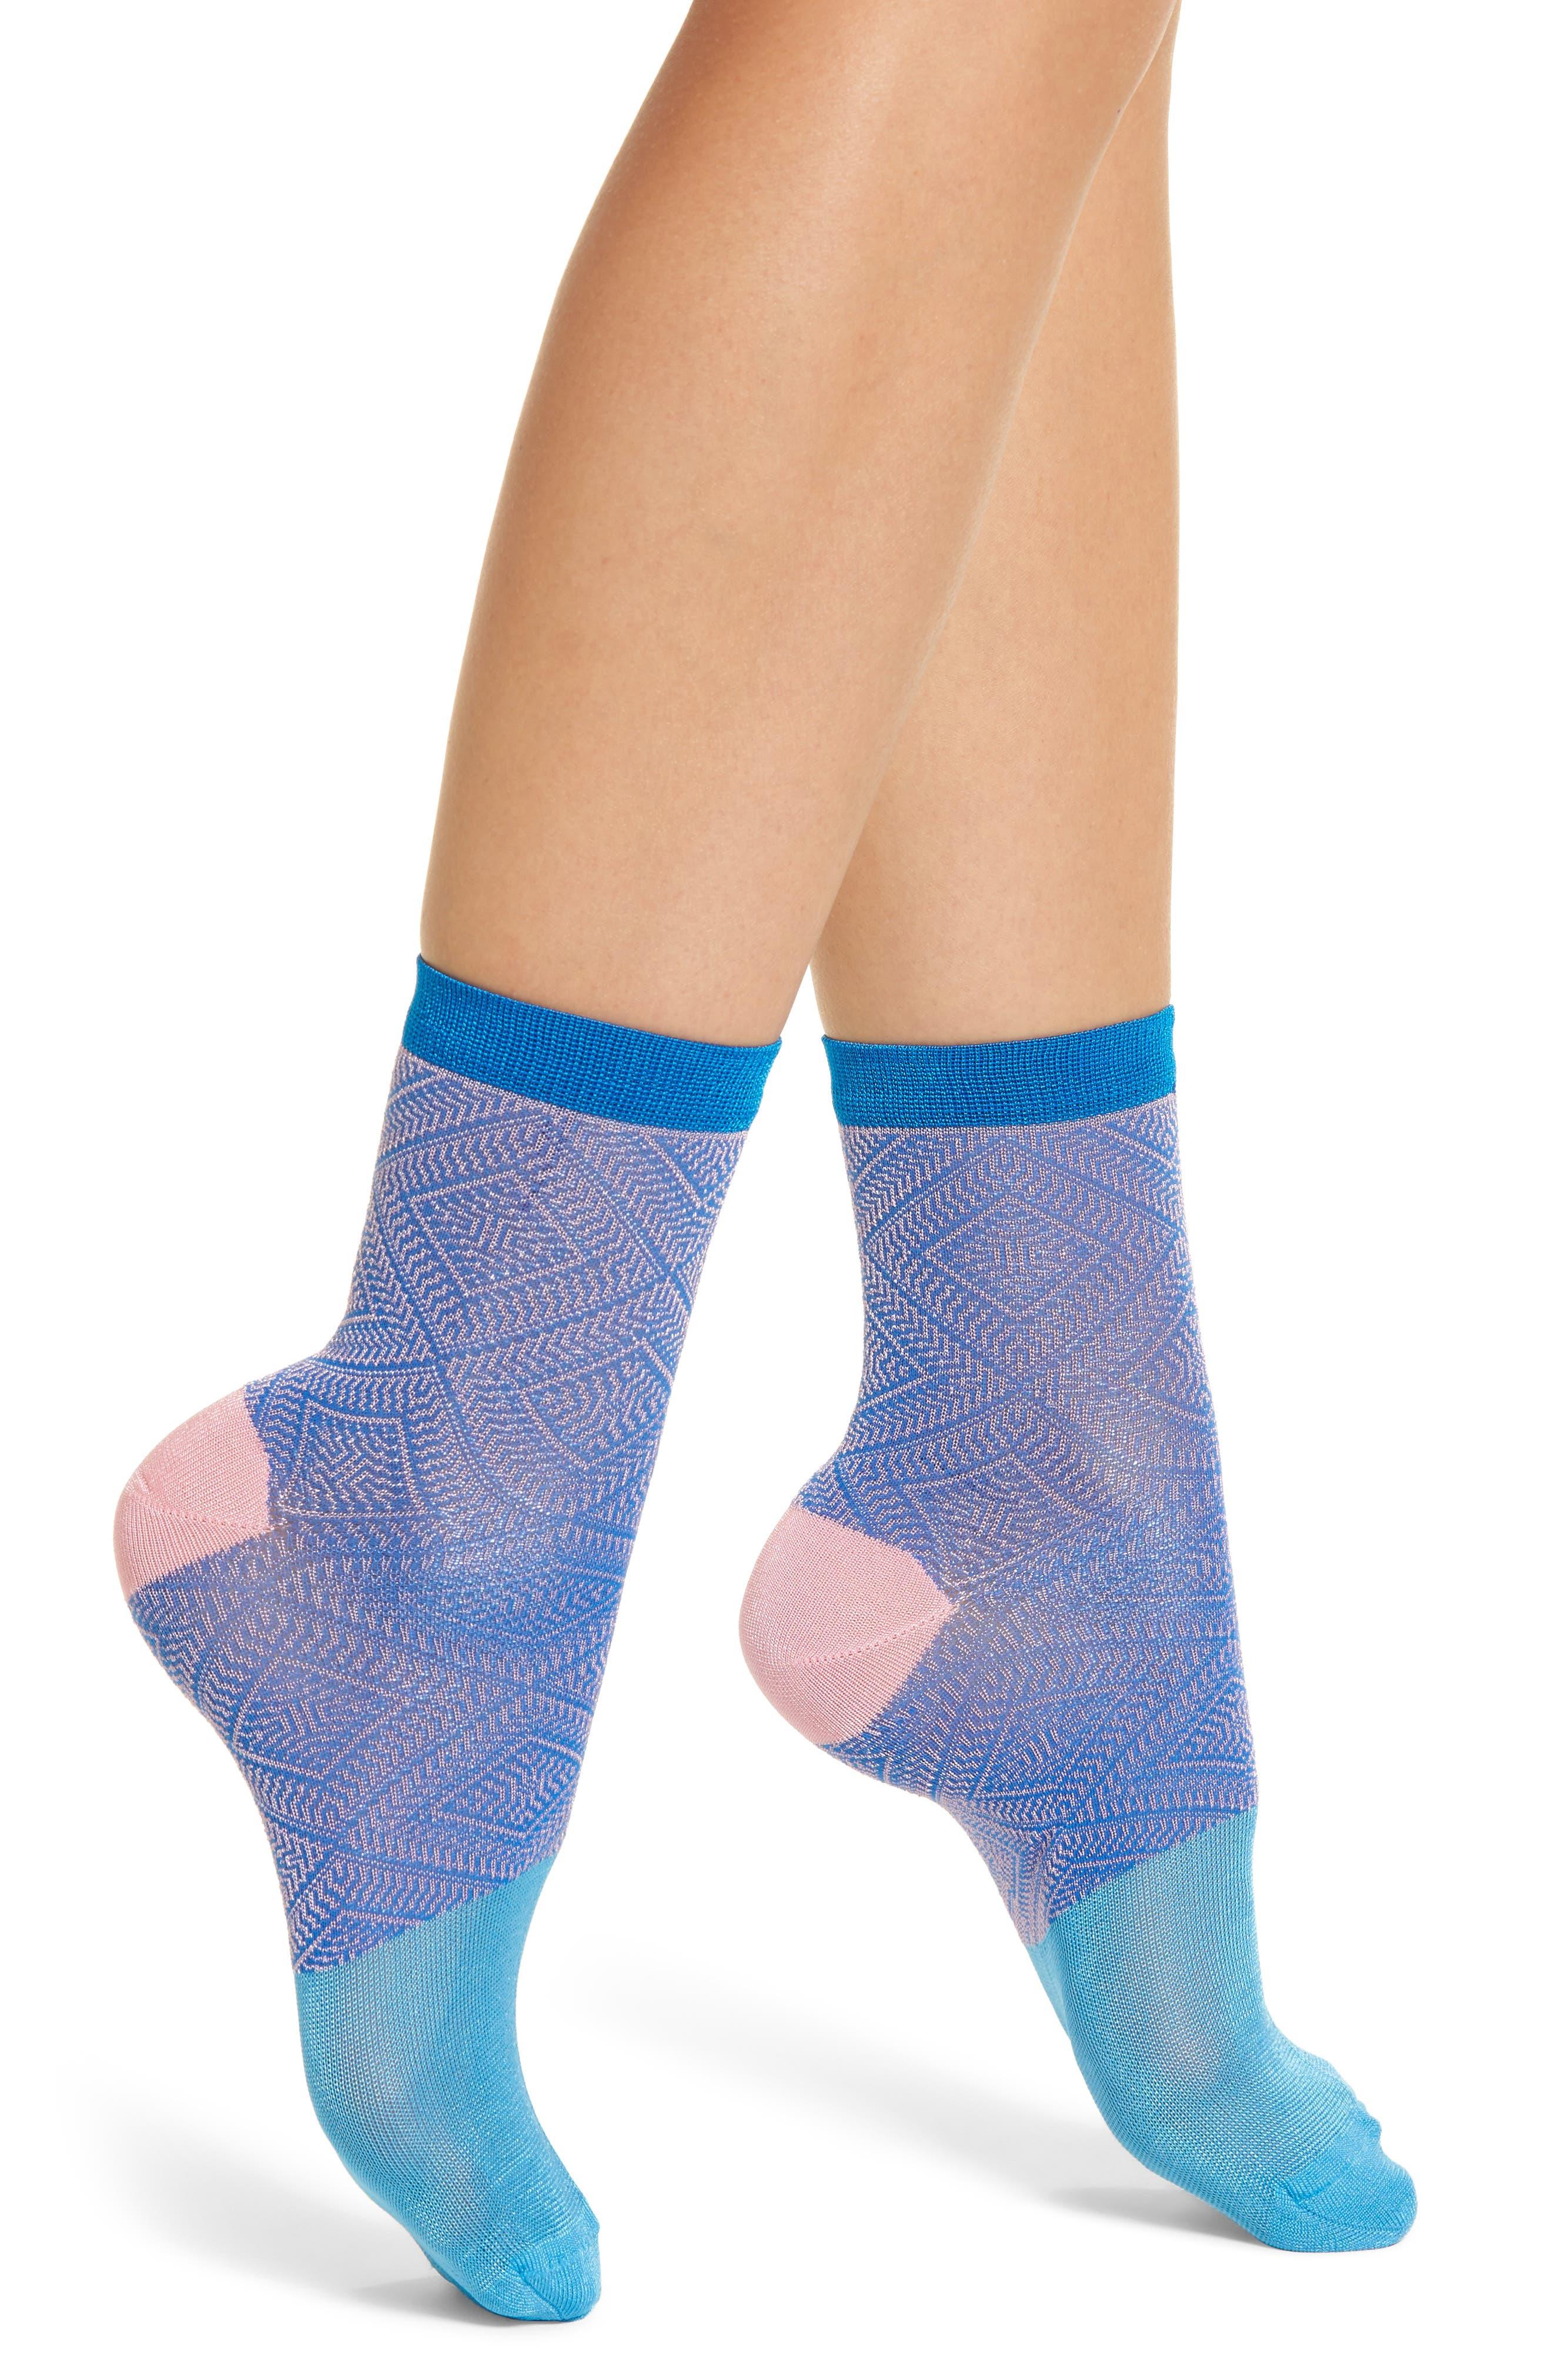 Jill Ankle Socks,                         Main,                         color,